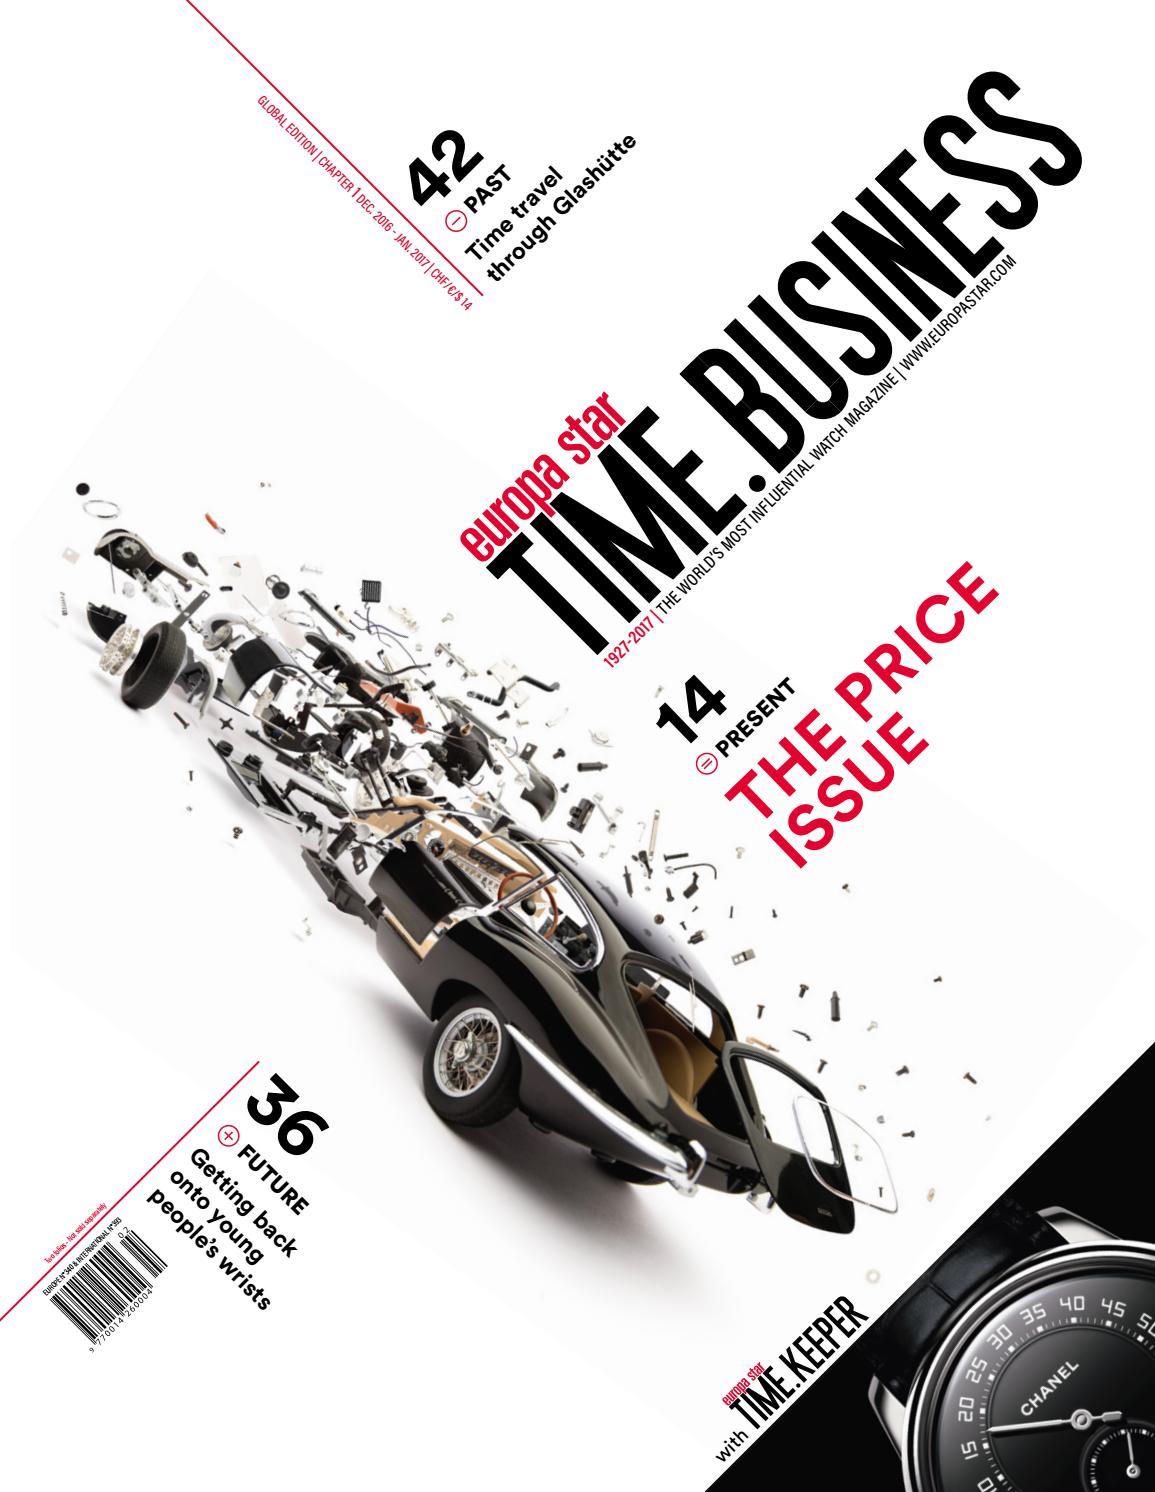 6372263deed6 Europastar time business 117 lr by Europa Star HBM - issuu